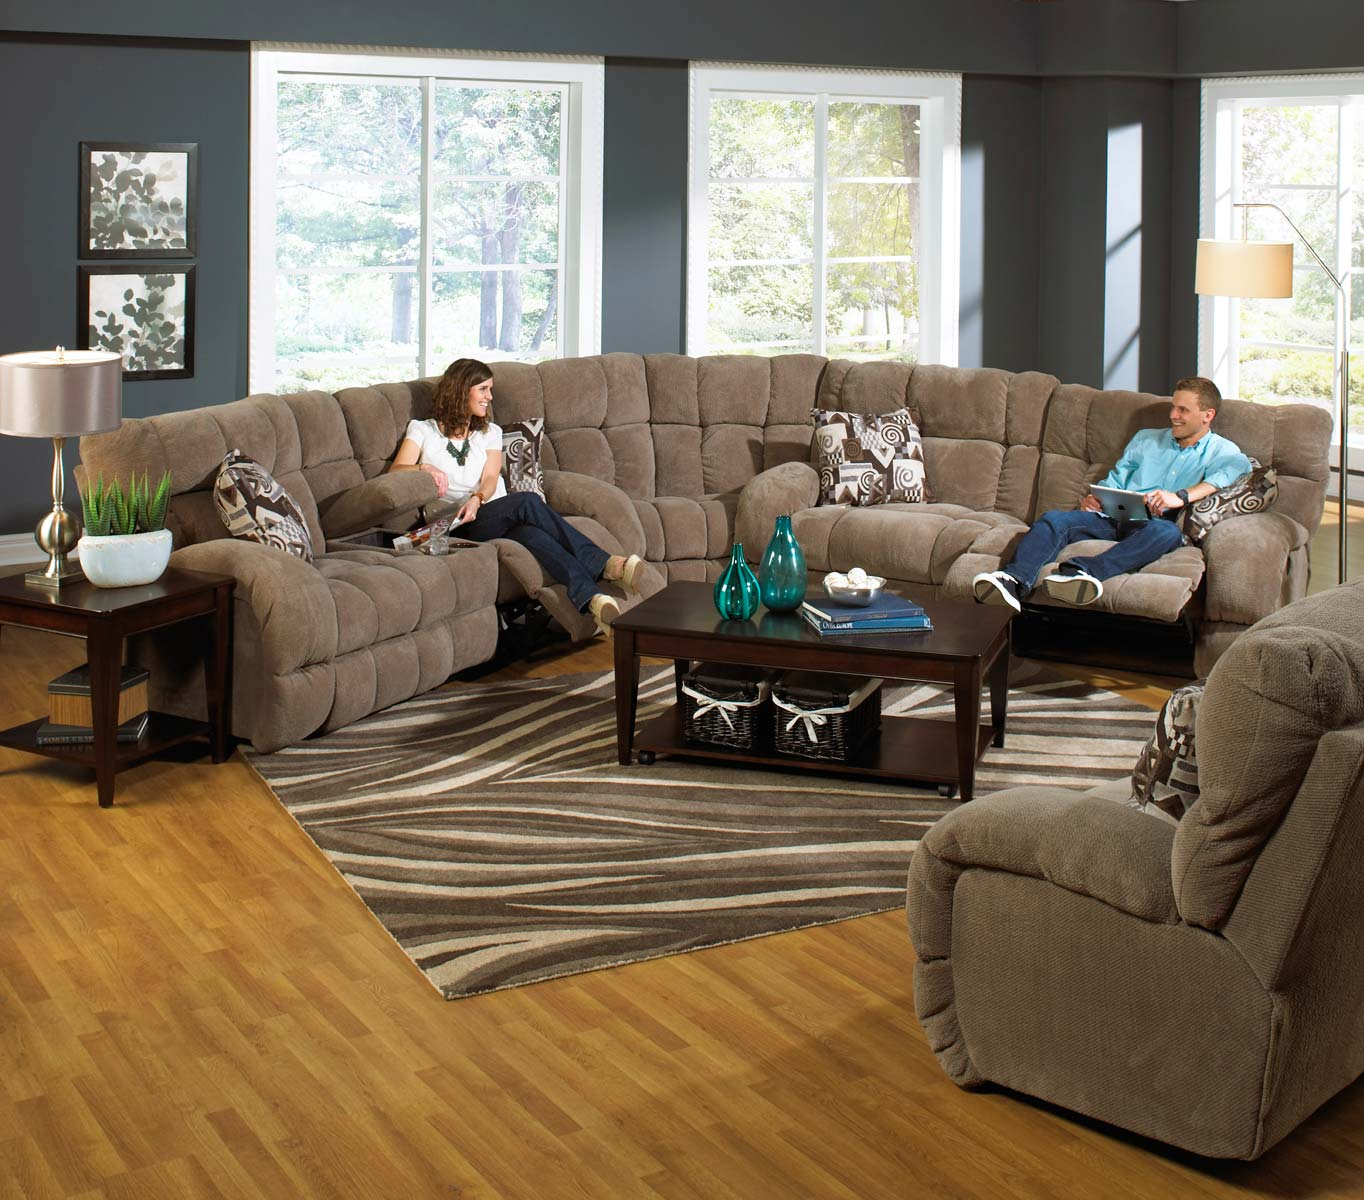 CatNapper Siesta Lay Flat Reclining Sectional Sofa Set A - Porcini